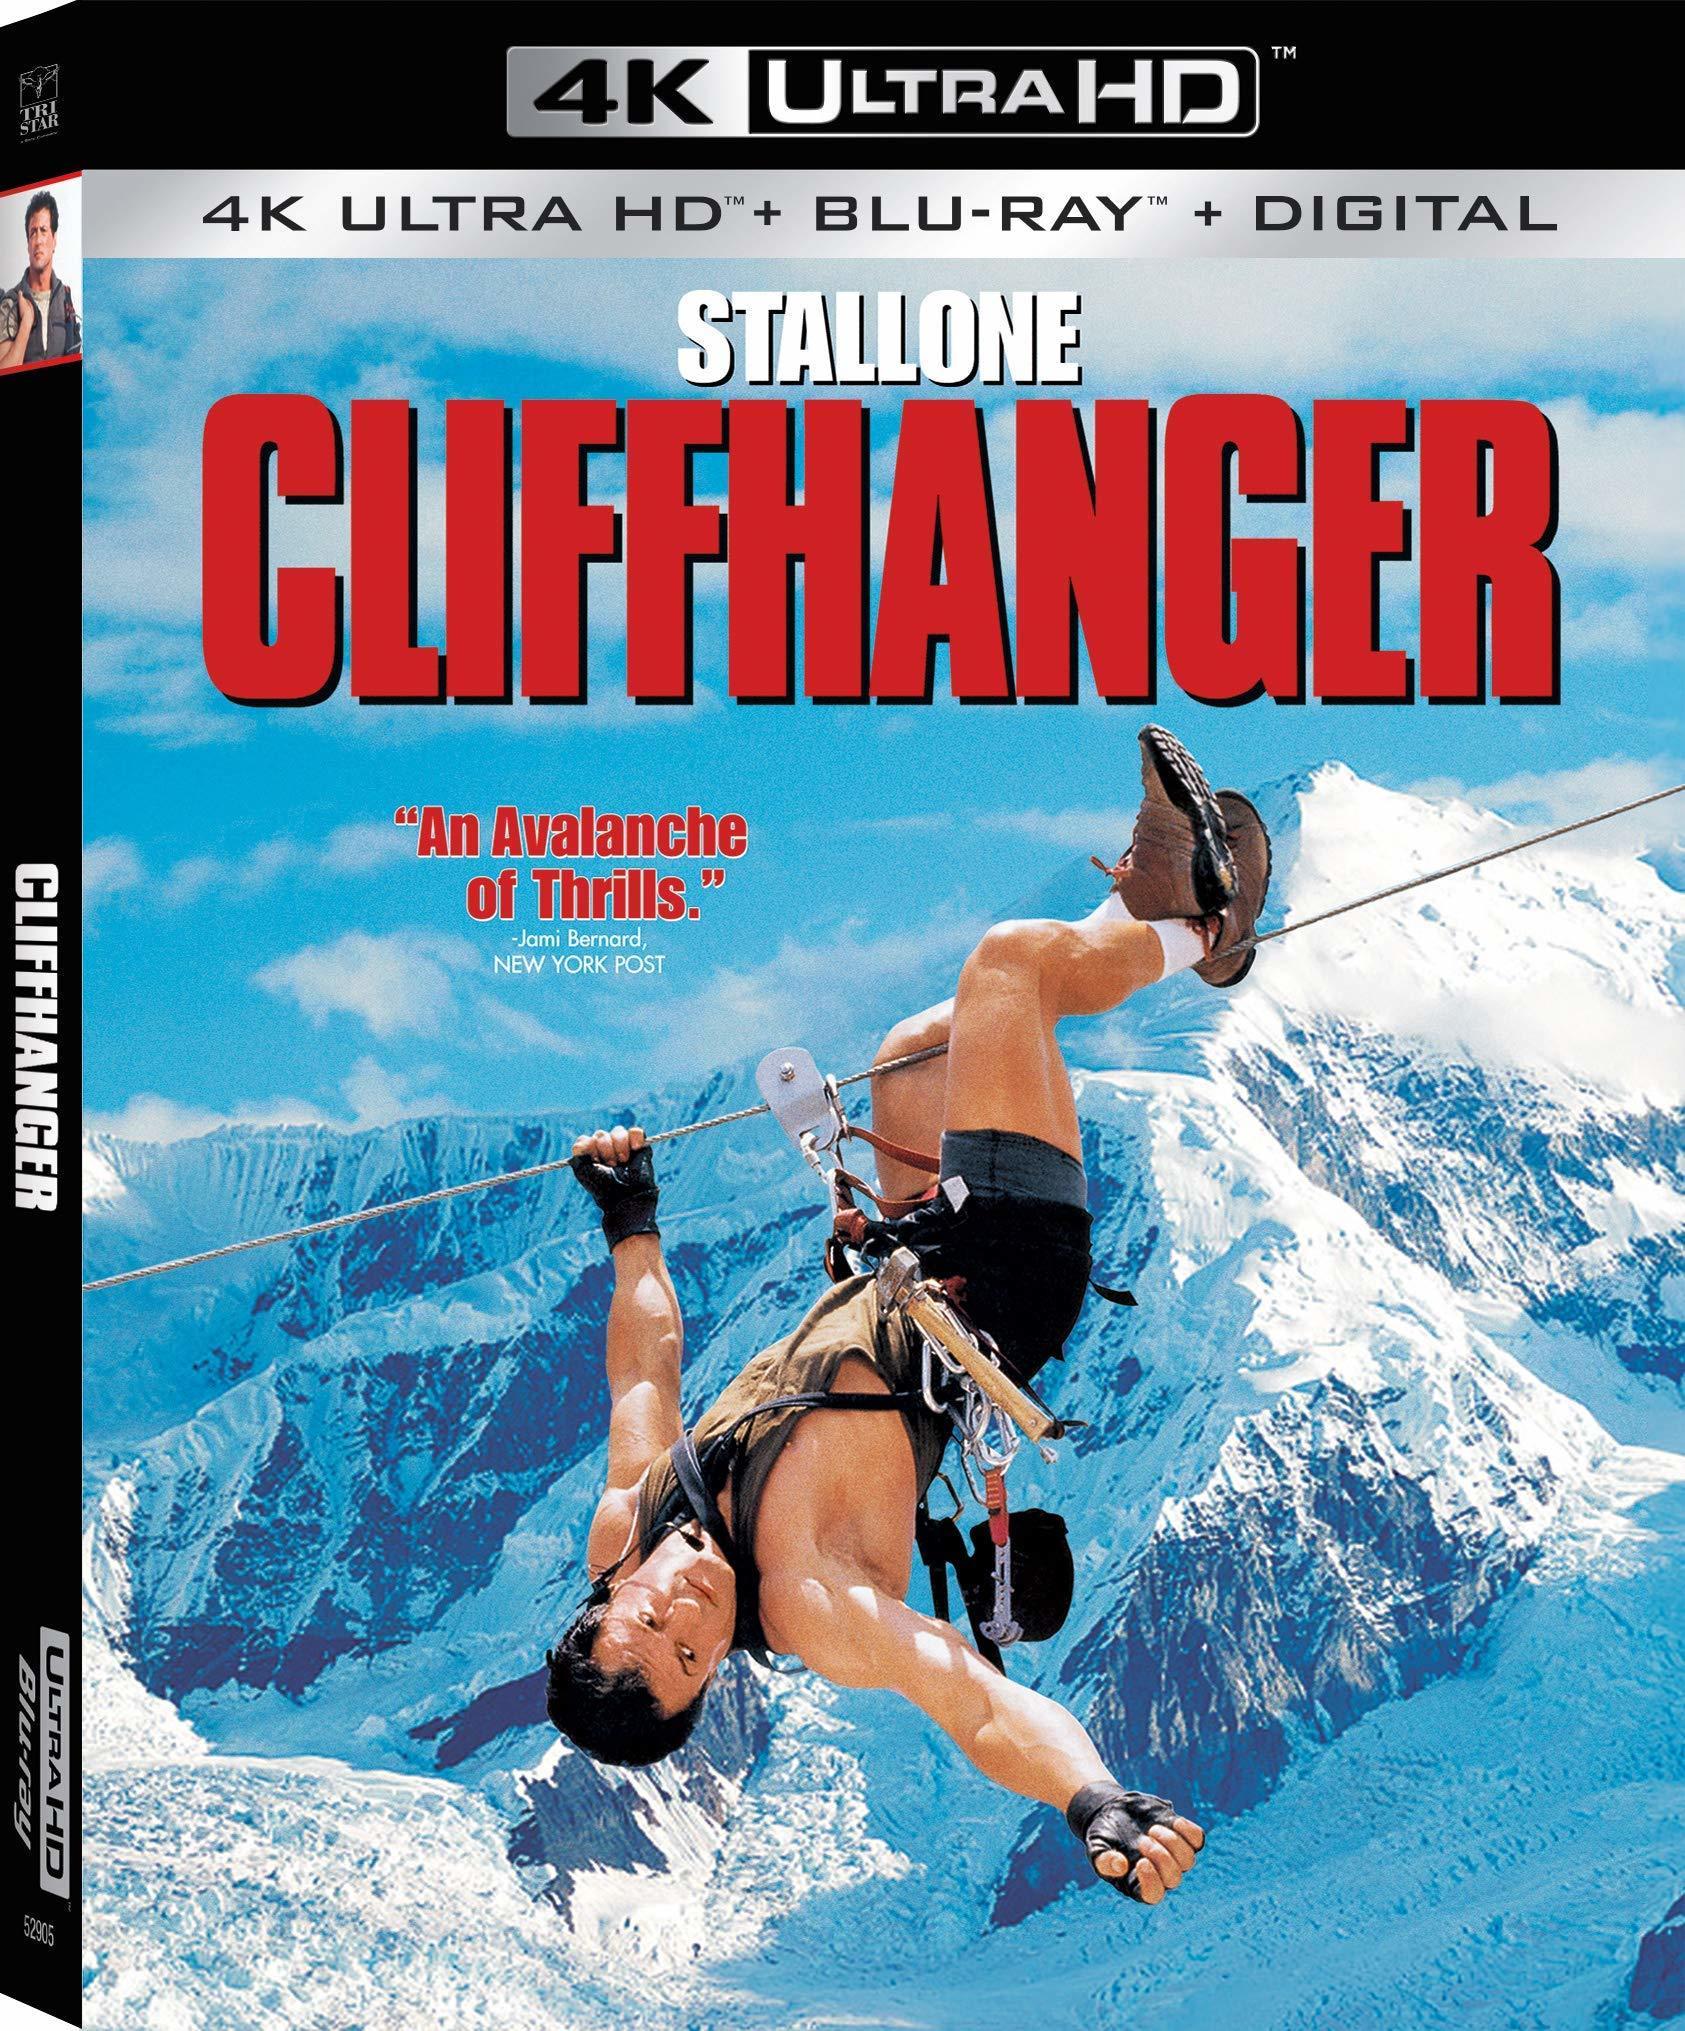 Cliffhanger (1993) poster image